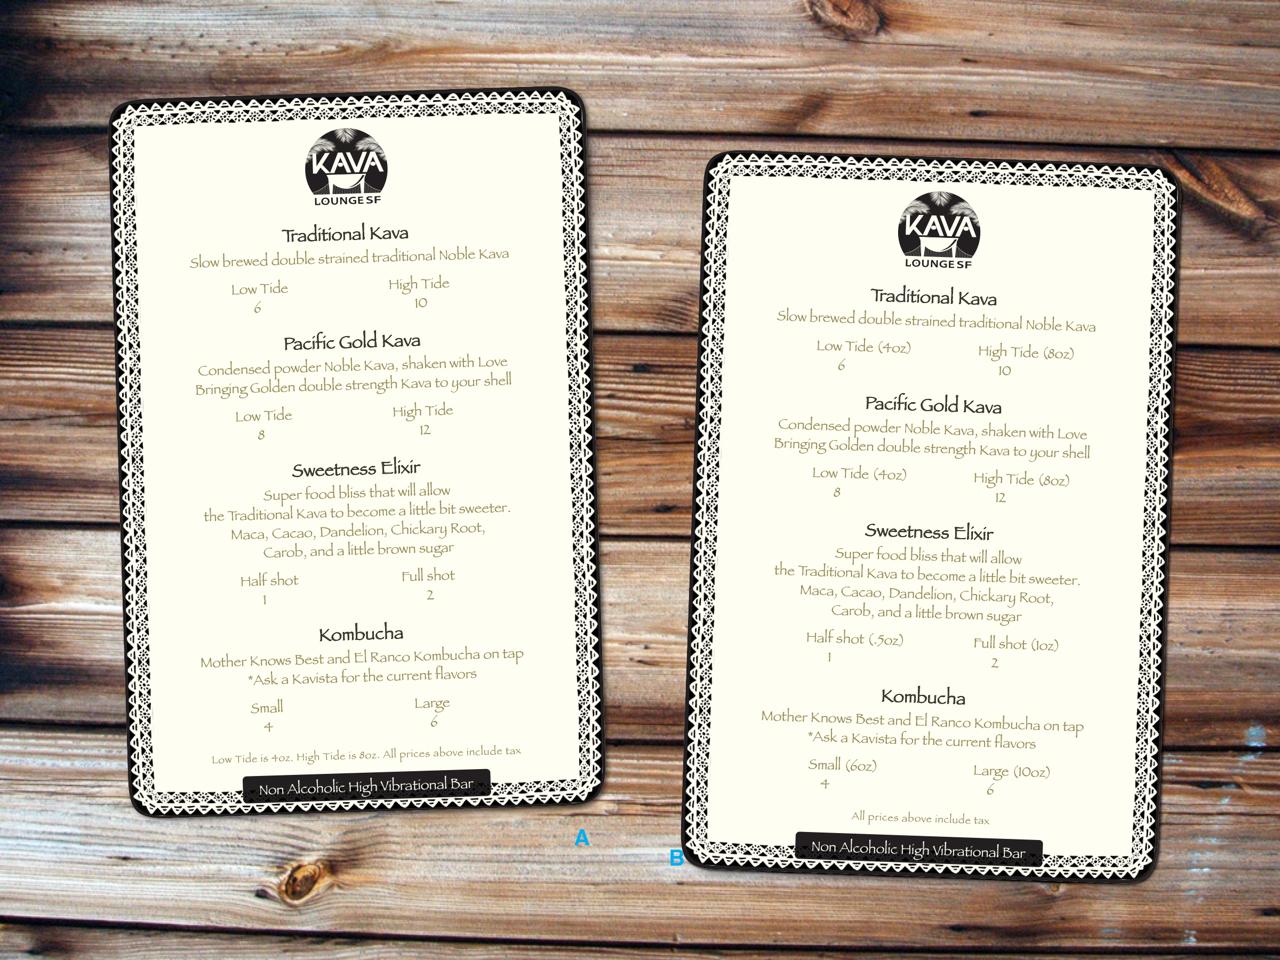 kava menu.jpg